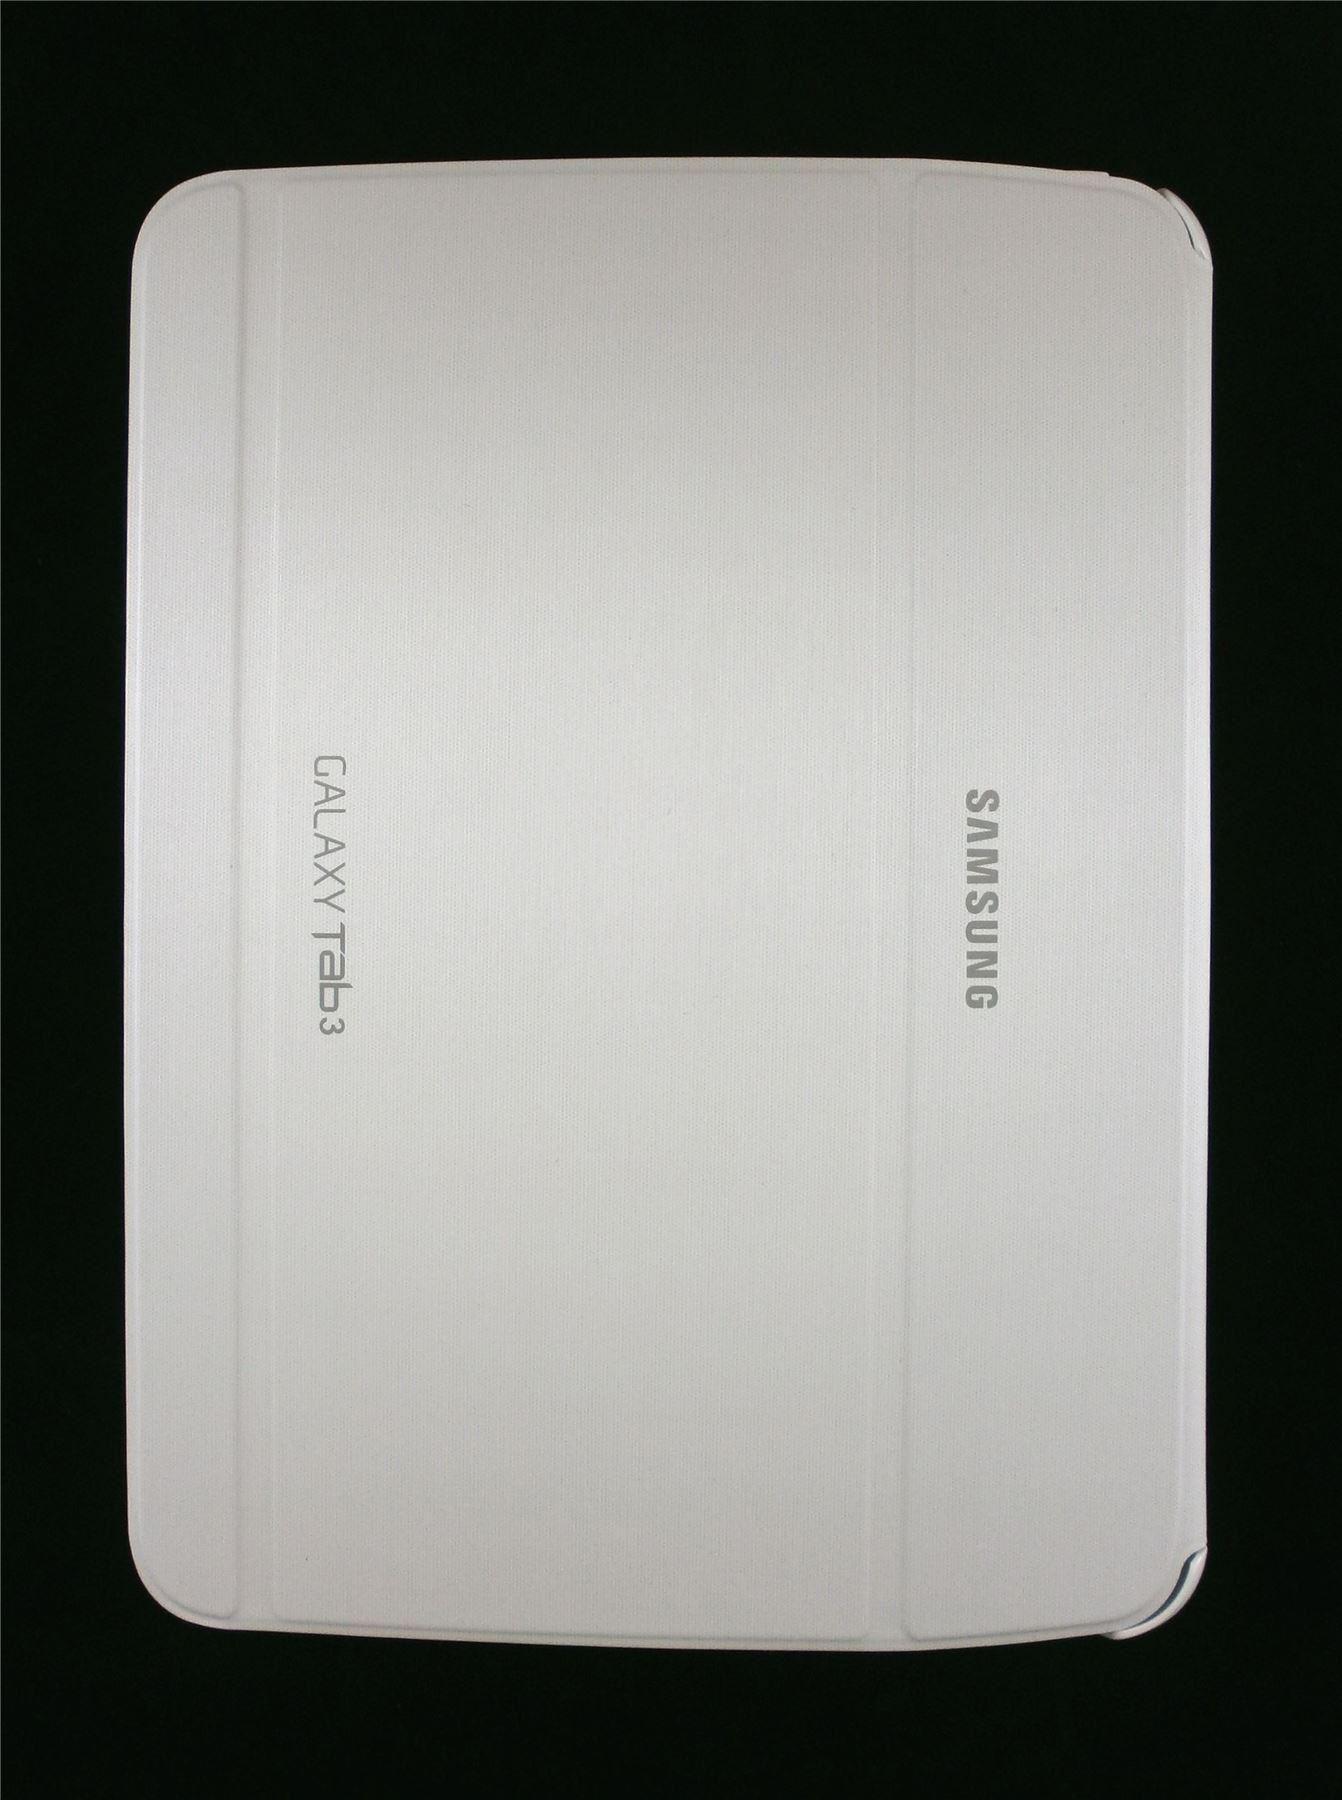 Samsung Book Cover White ~ Samsung book cover galaxy tab quot white efbp bweguj